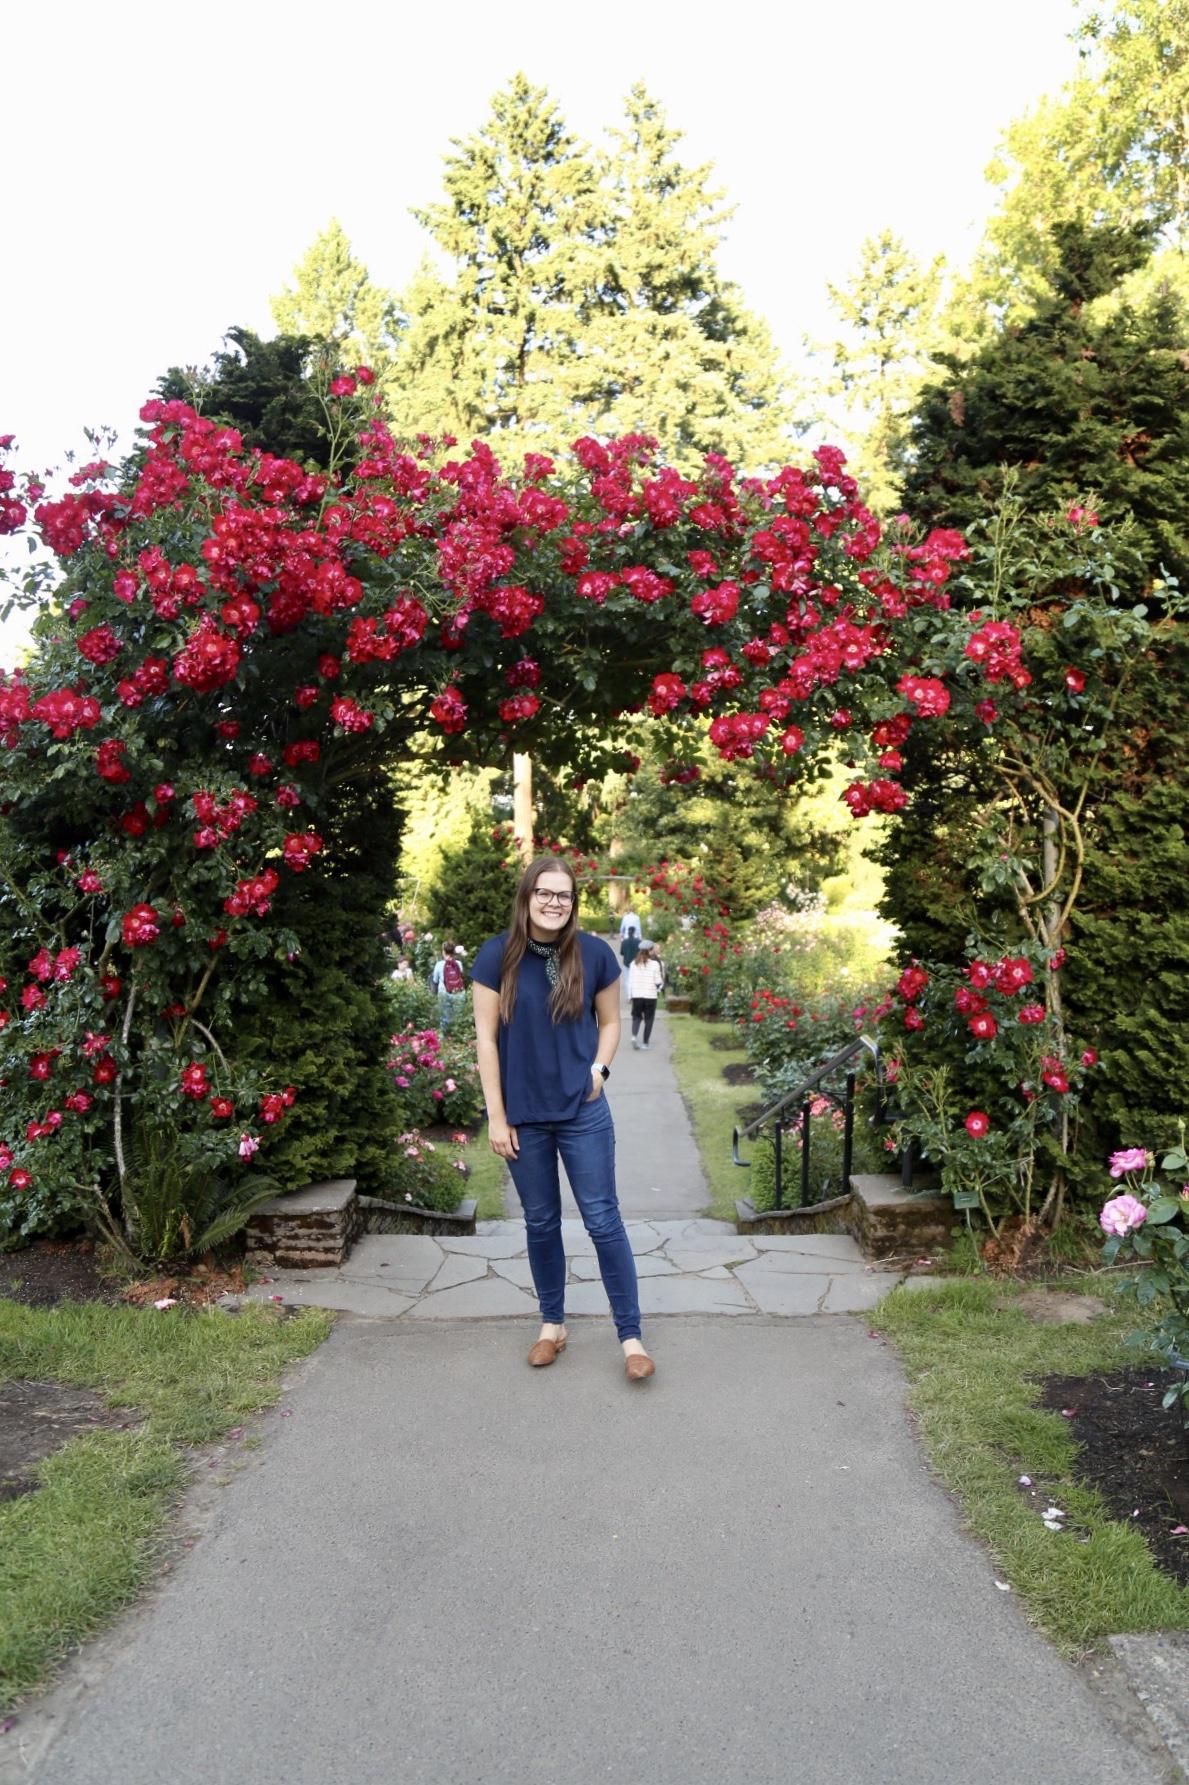 The Ultimate Extended Weekend in Portland, Oregon - International Rose Test Garden